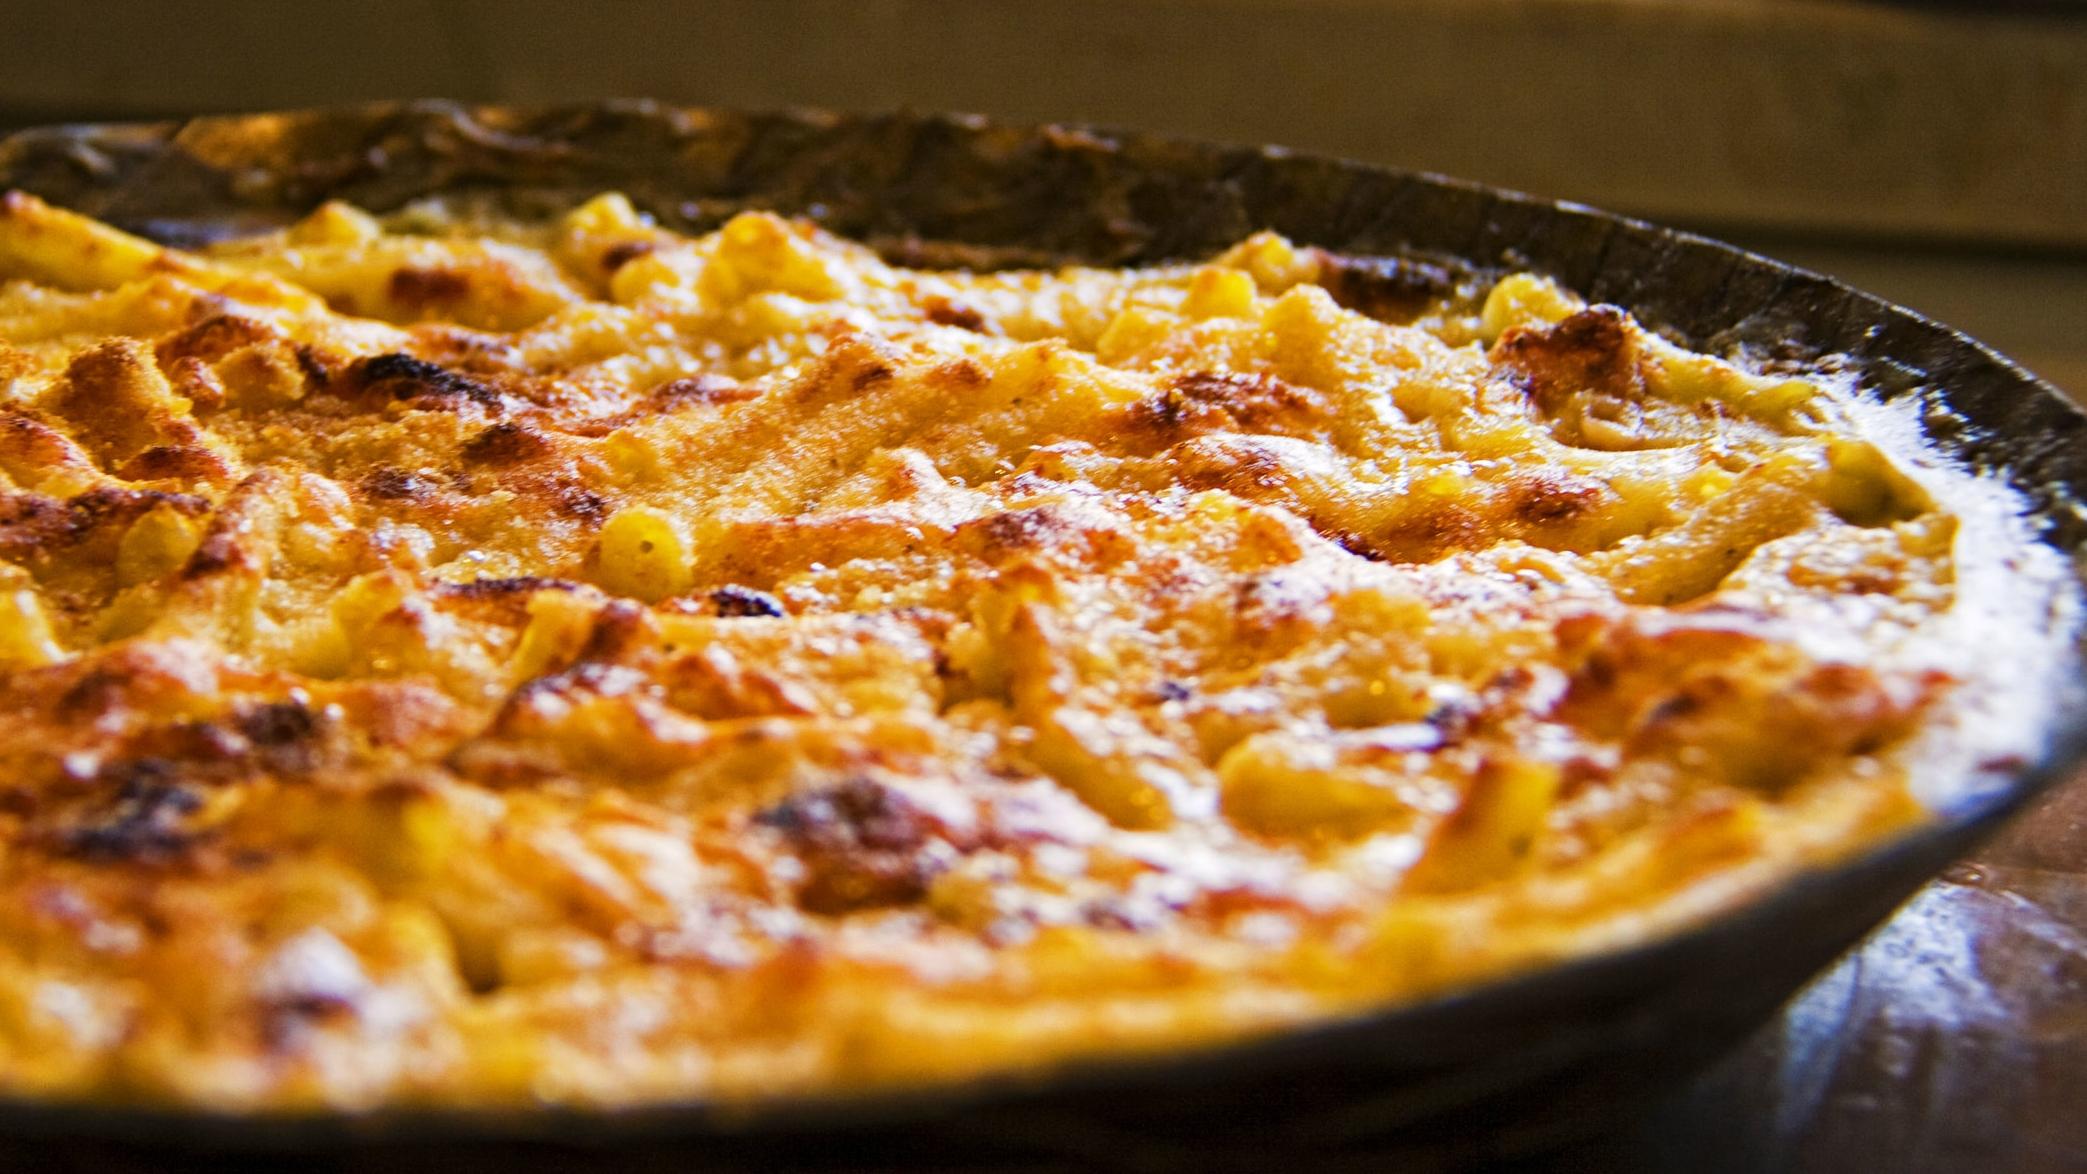 Baked_macaroni_and_cheese_1.jpg